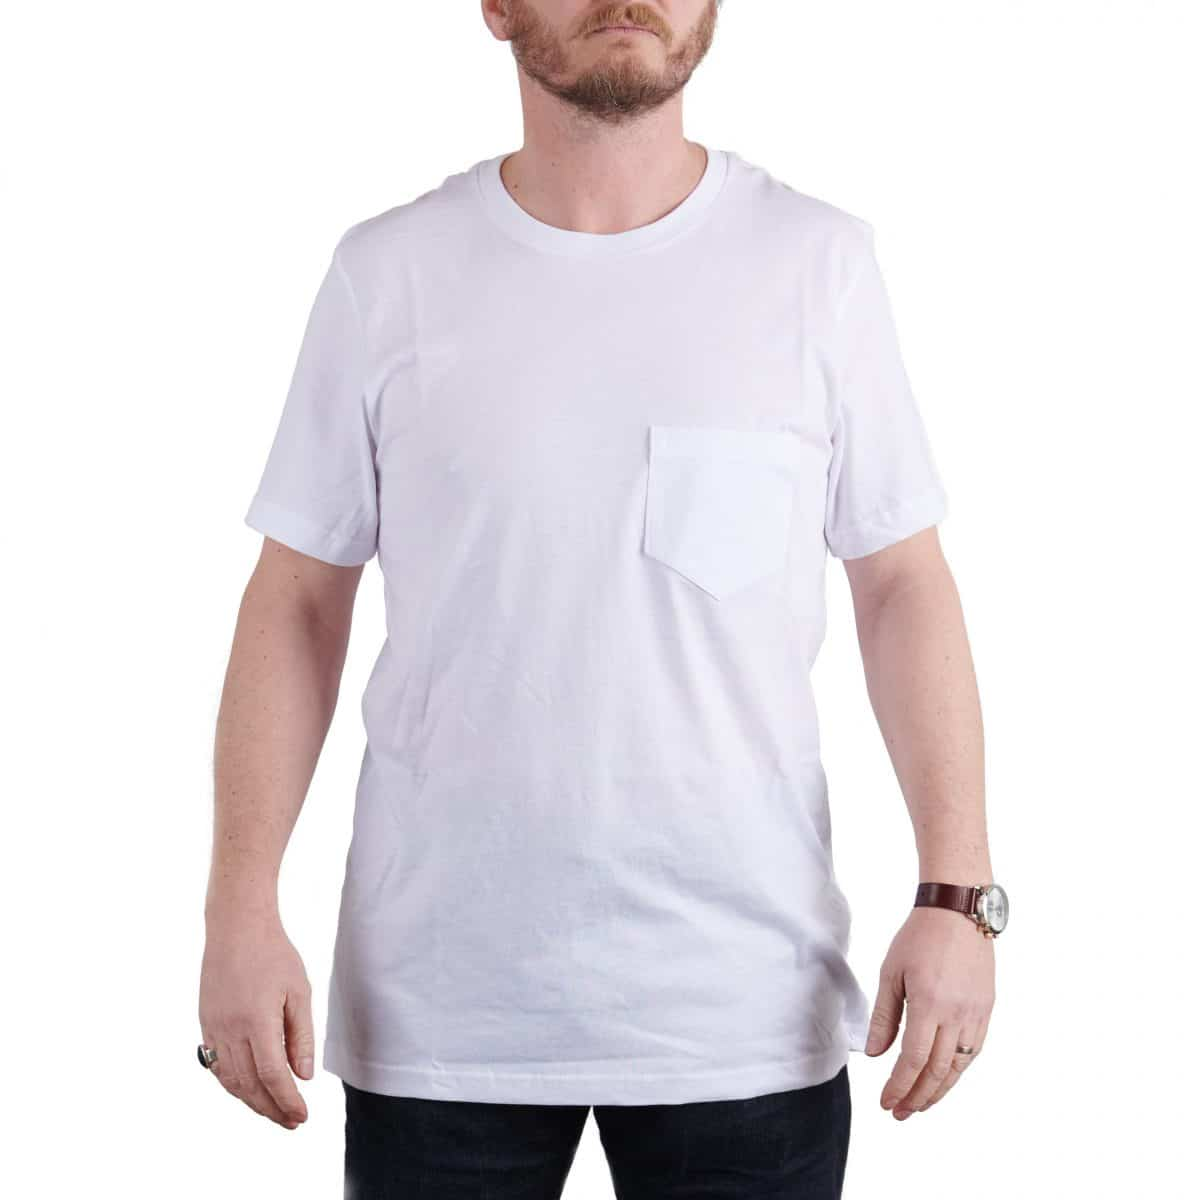 MIlo's Classic White Cotton T-shirt